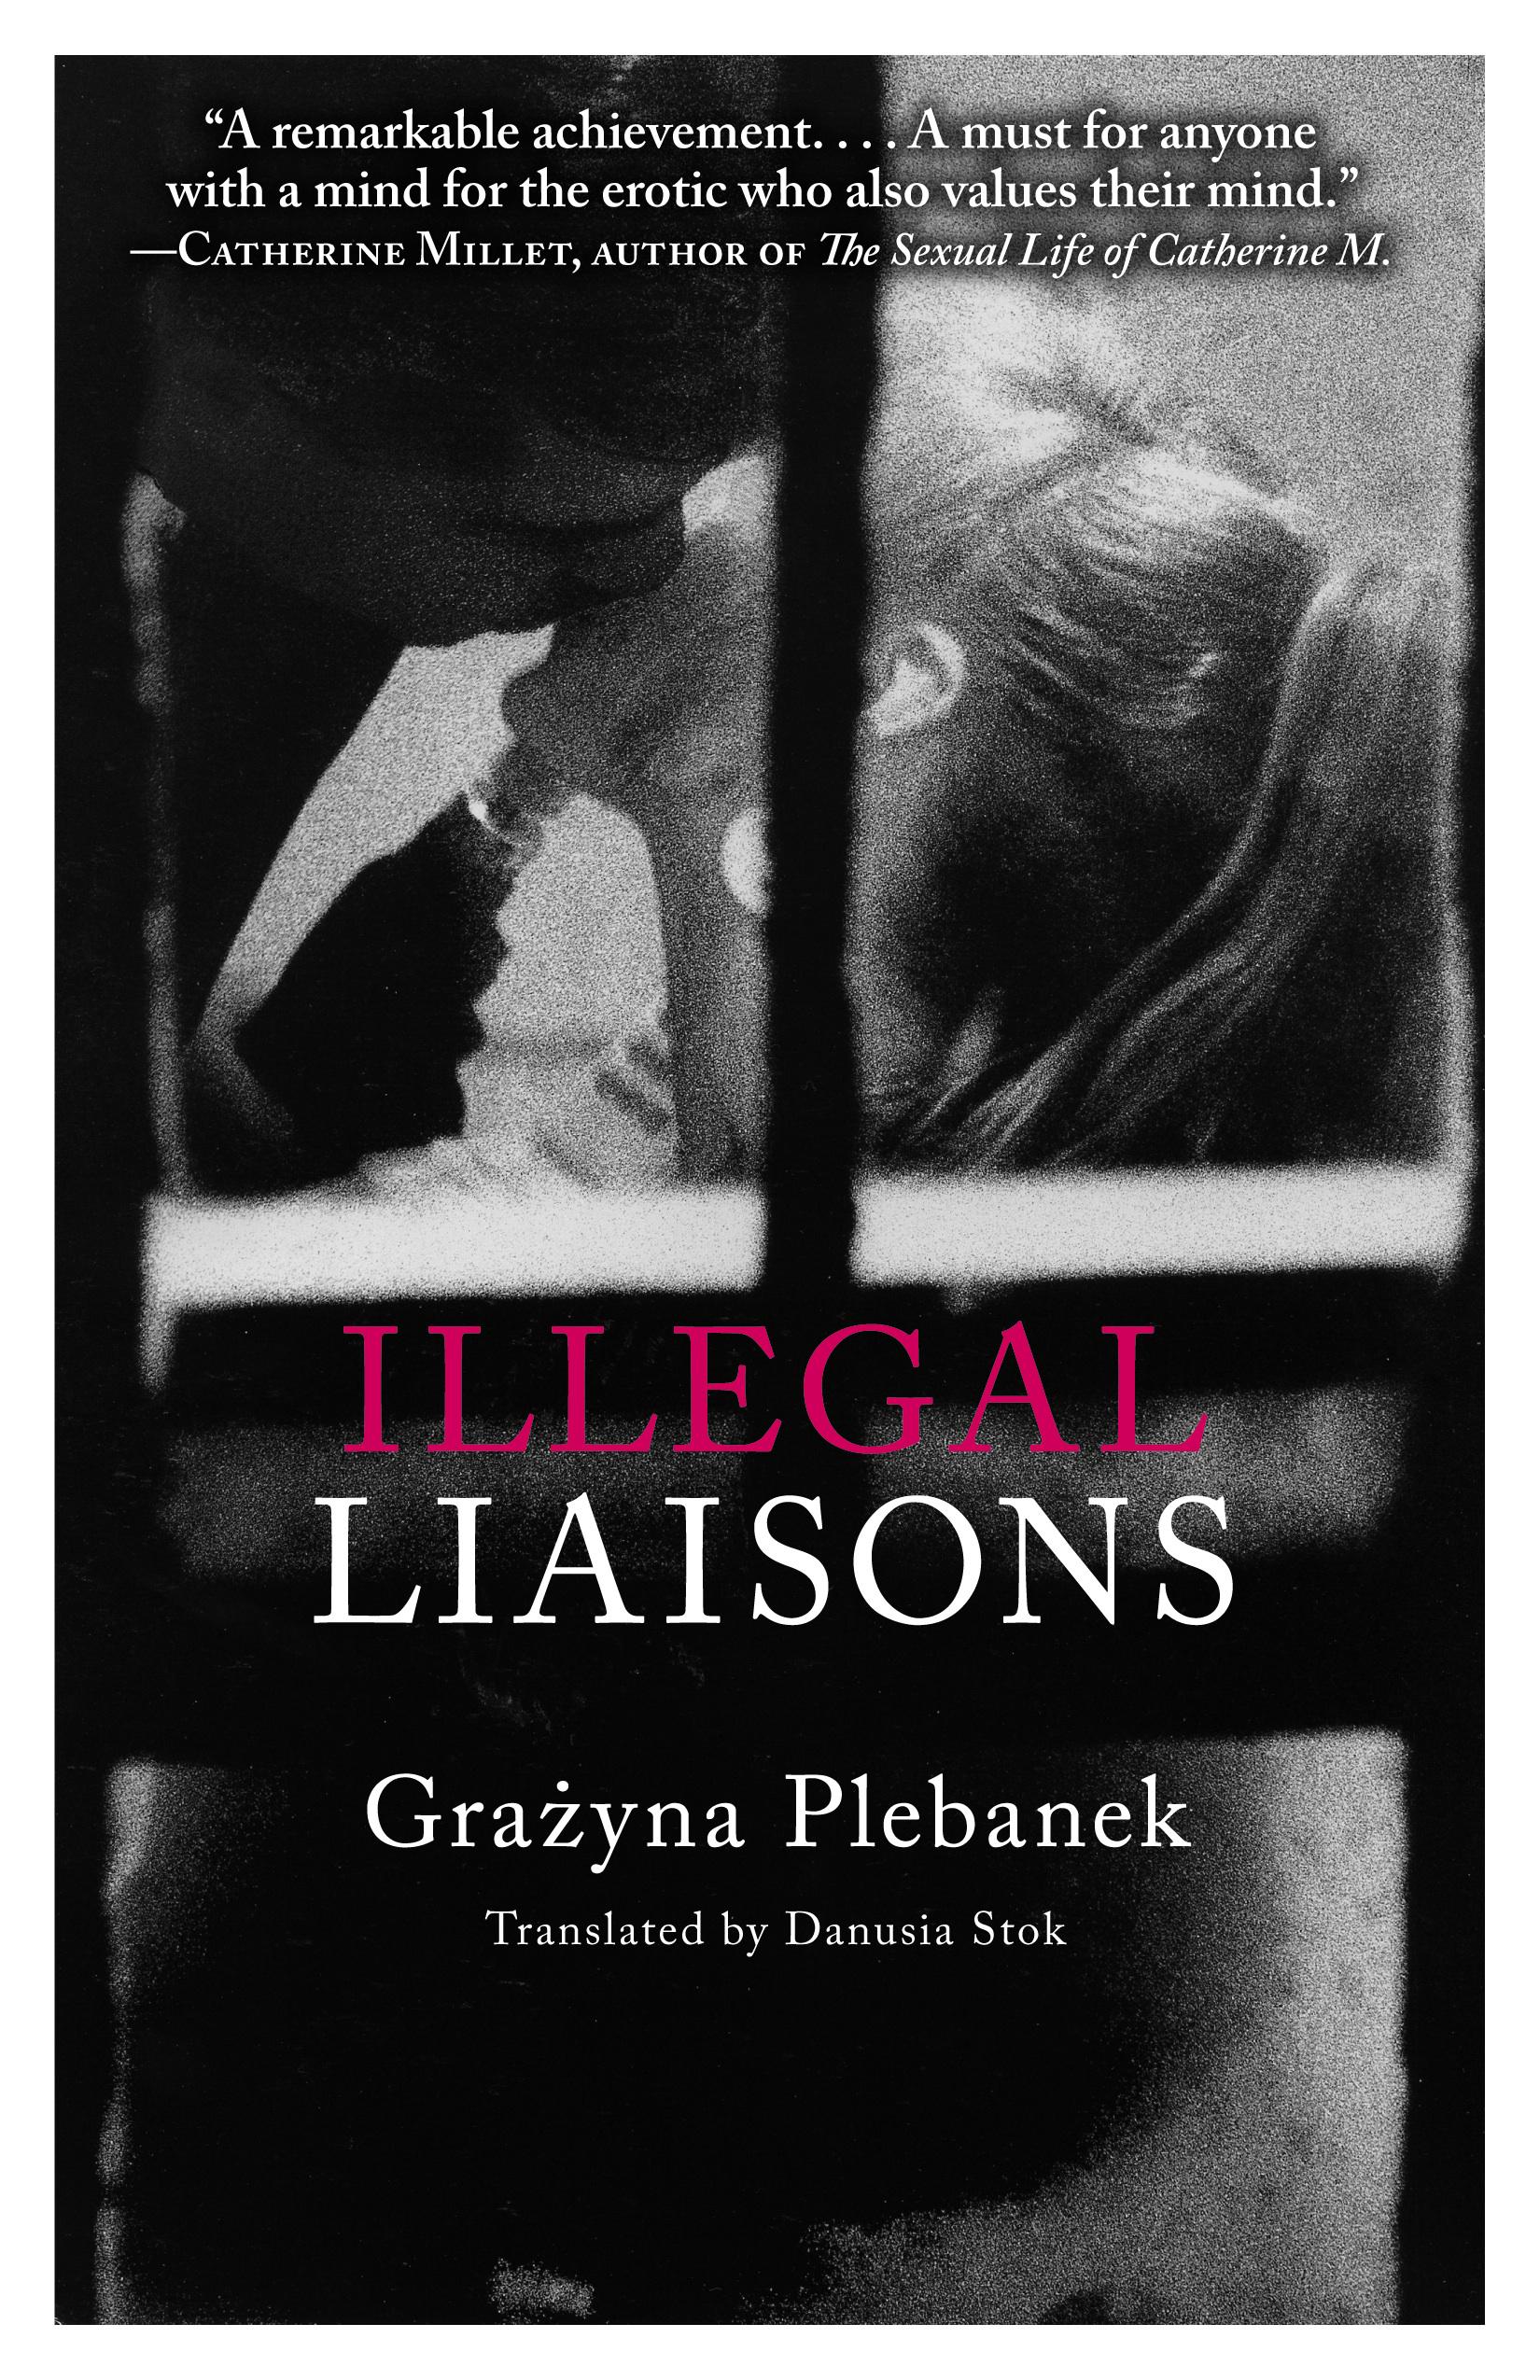 IllegalLiaisons_cover.jpg